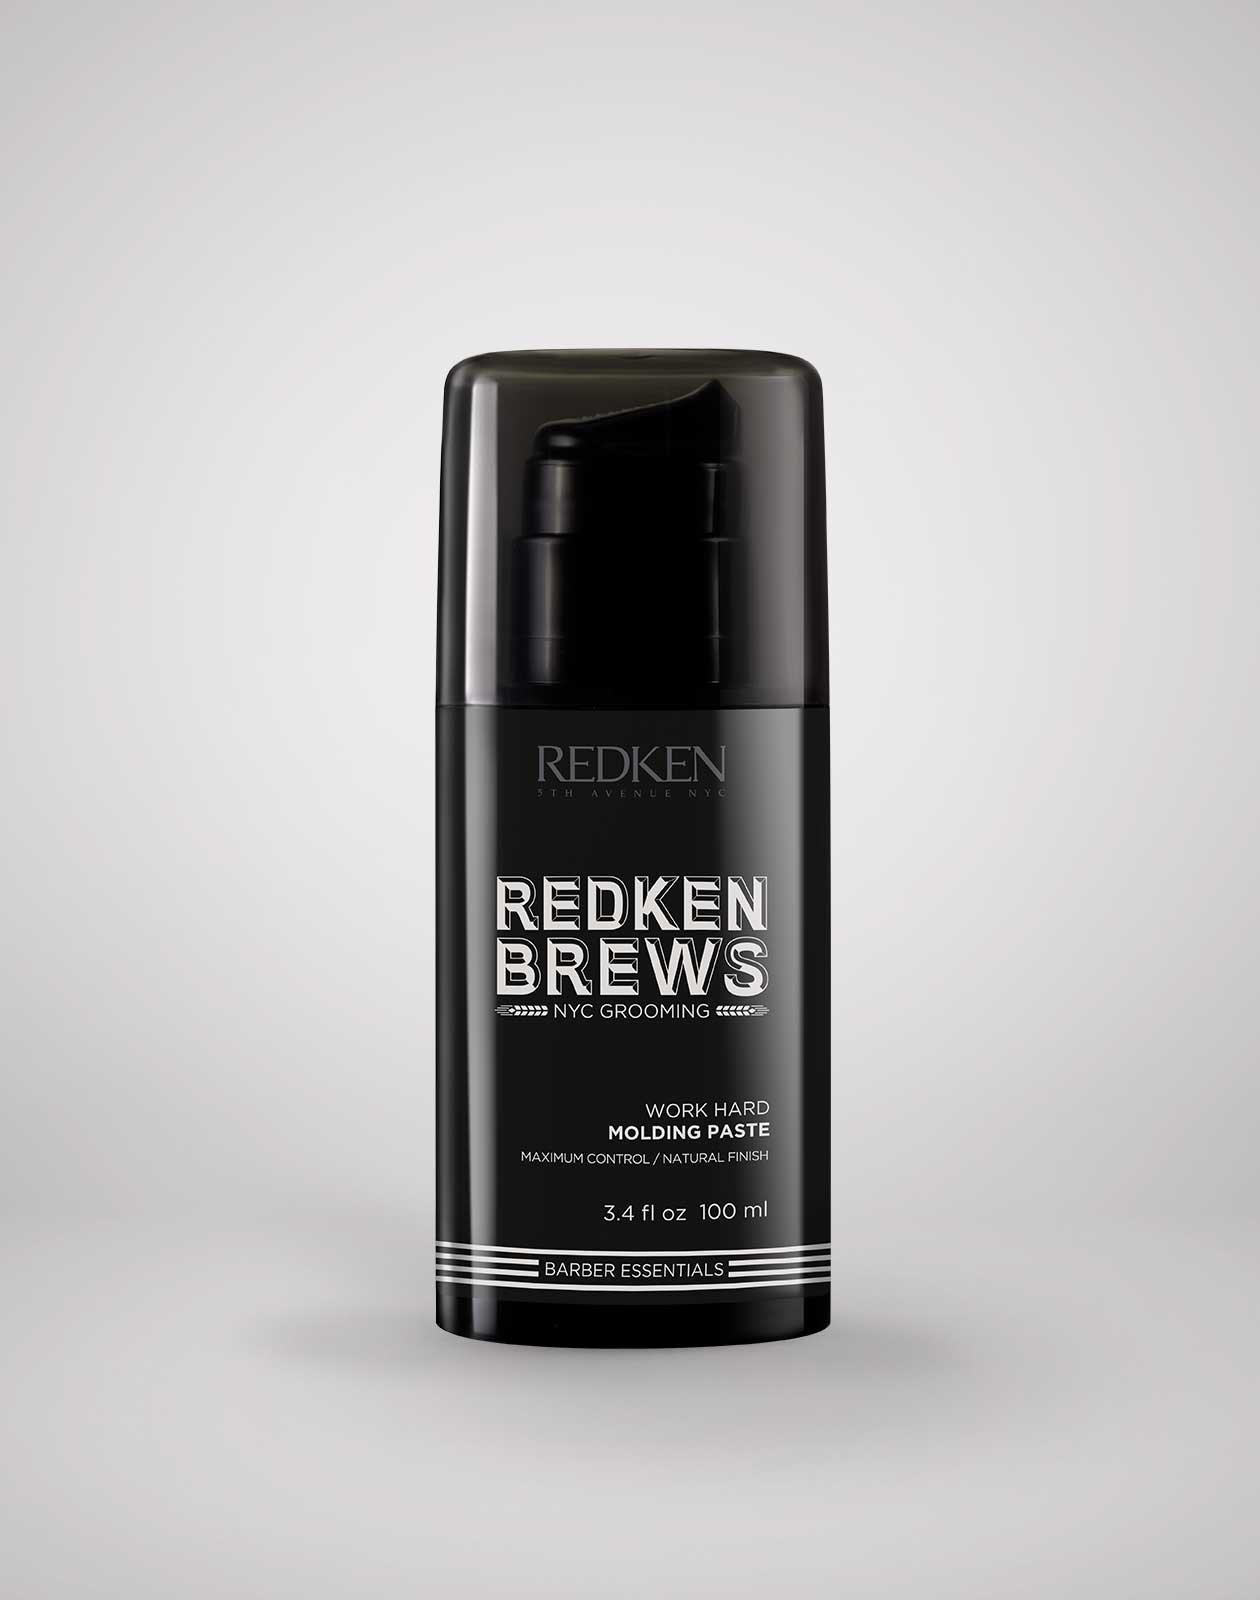 Redken Brews Work Hard Maximum Control Molding Paste 3.4 oz.